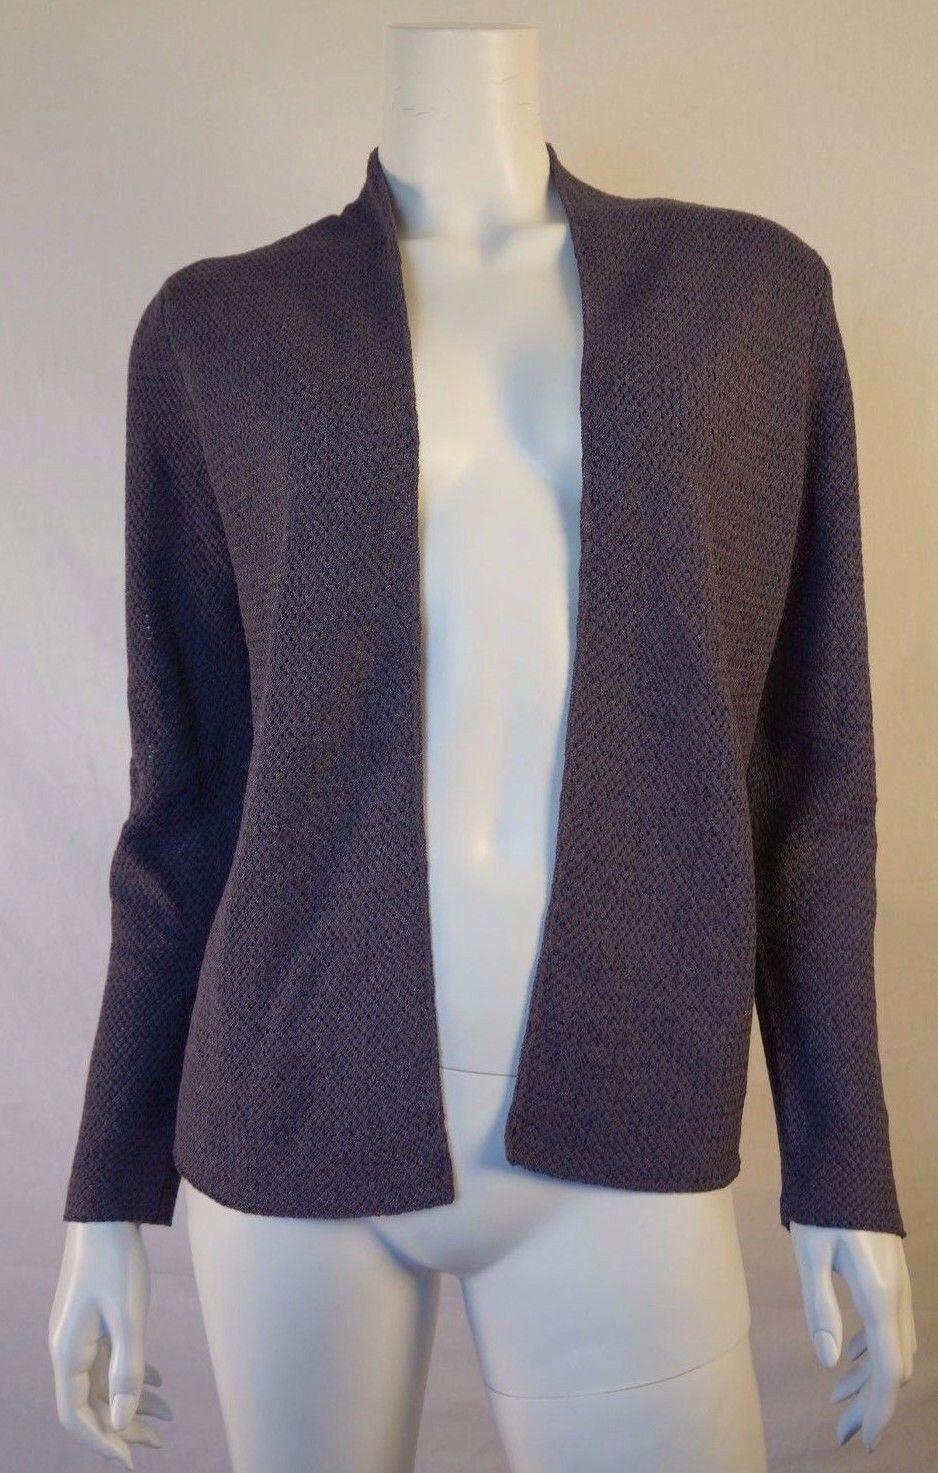 89ec350555a EILEEN FISHER Purple Knit Open Front Cardigan Sweater M sz  ozdoxl4251-Sweaters